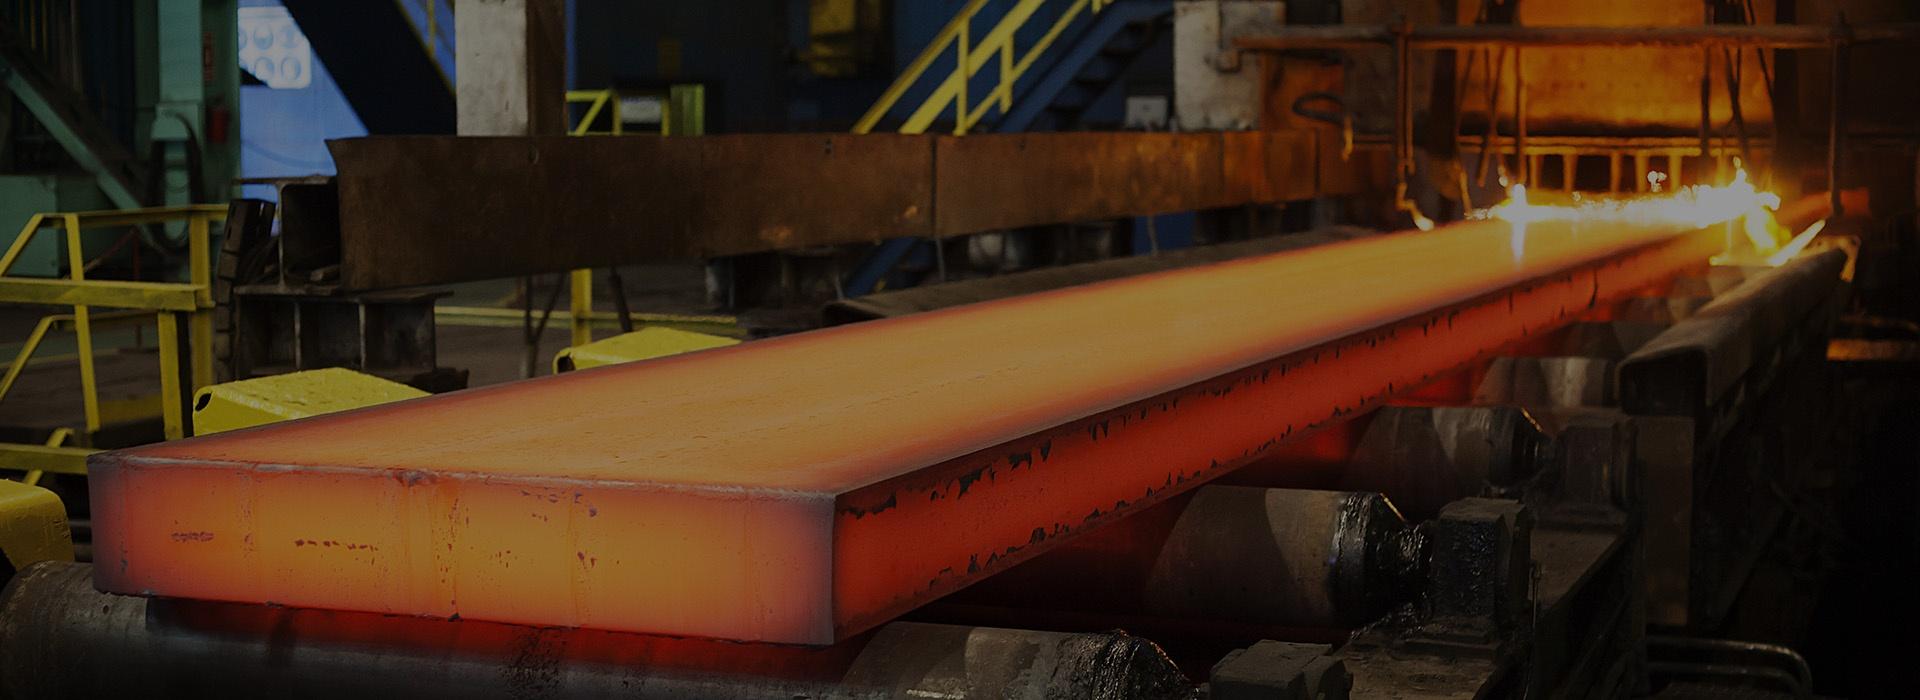 Stahlfabriken